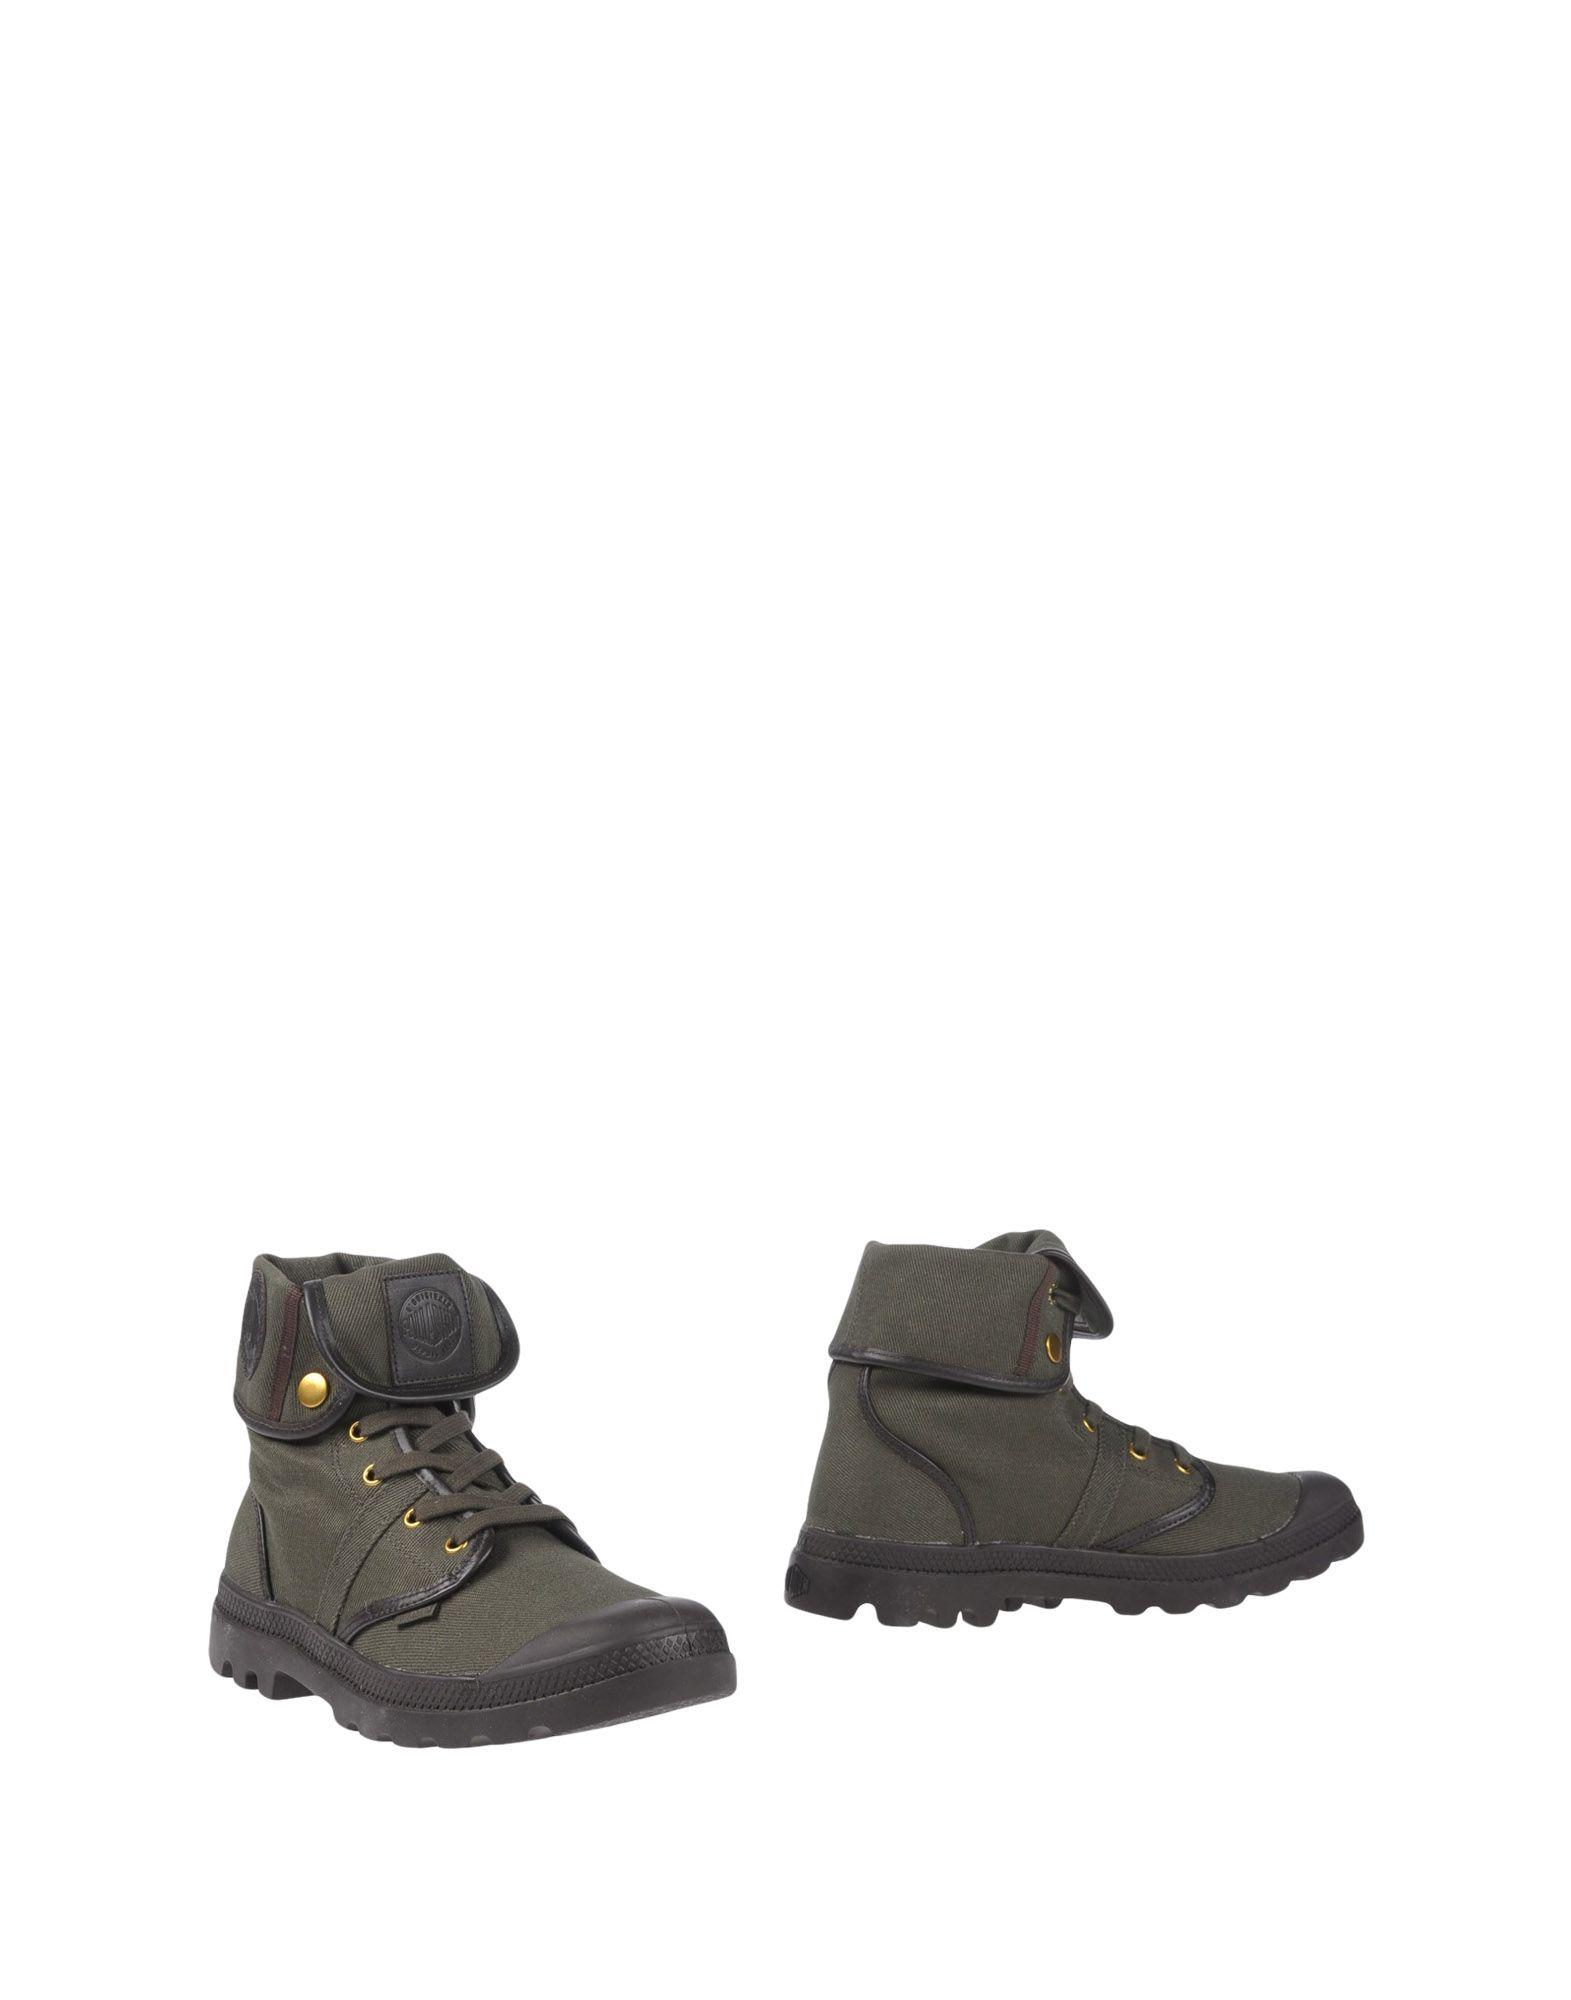 PALLADIUM Boots in Military Green